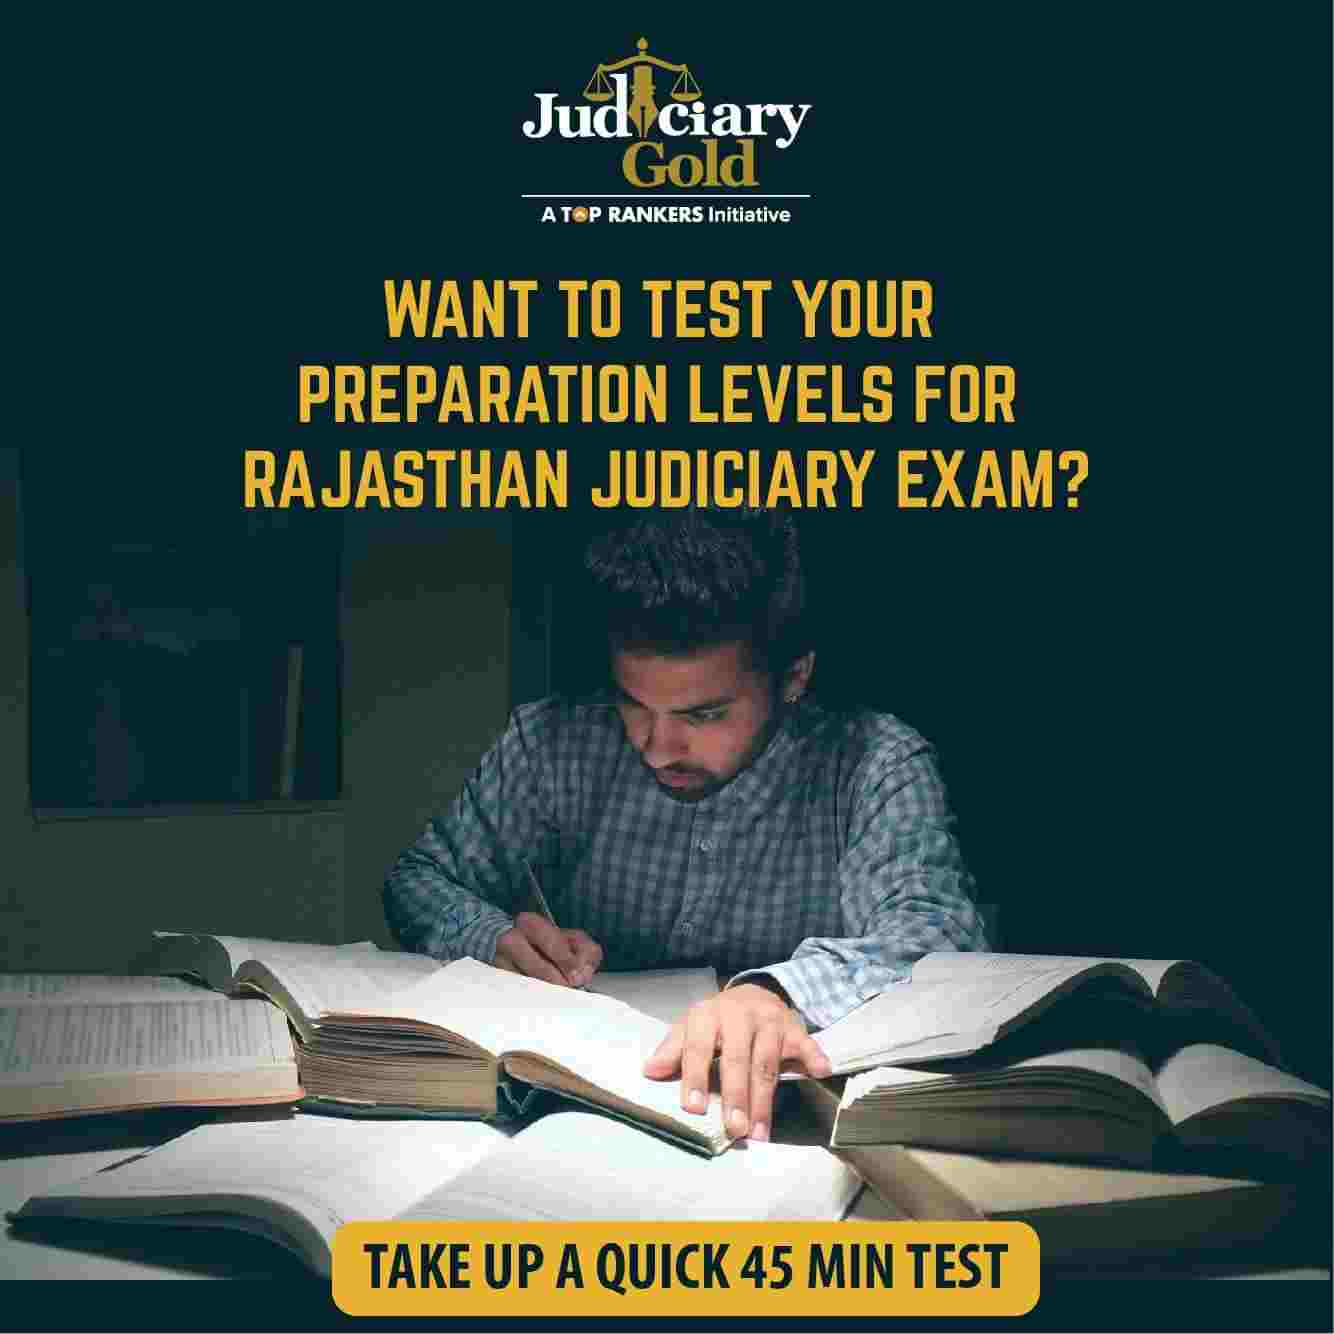 Rajasthan judiciary mock test